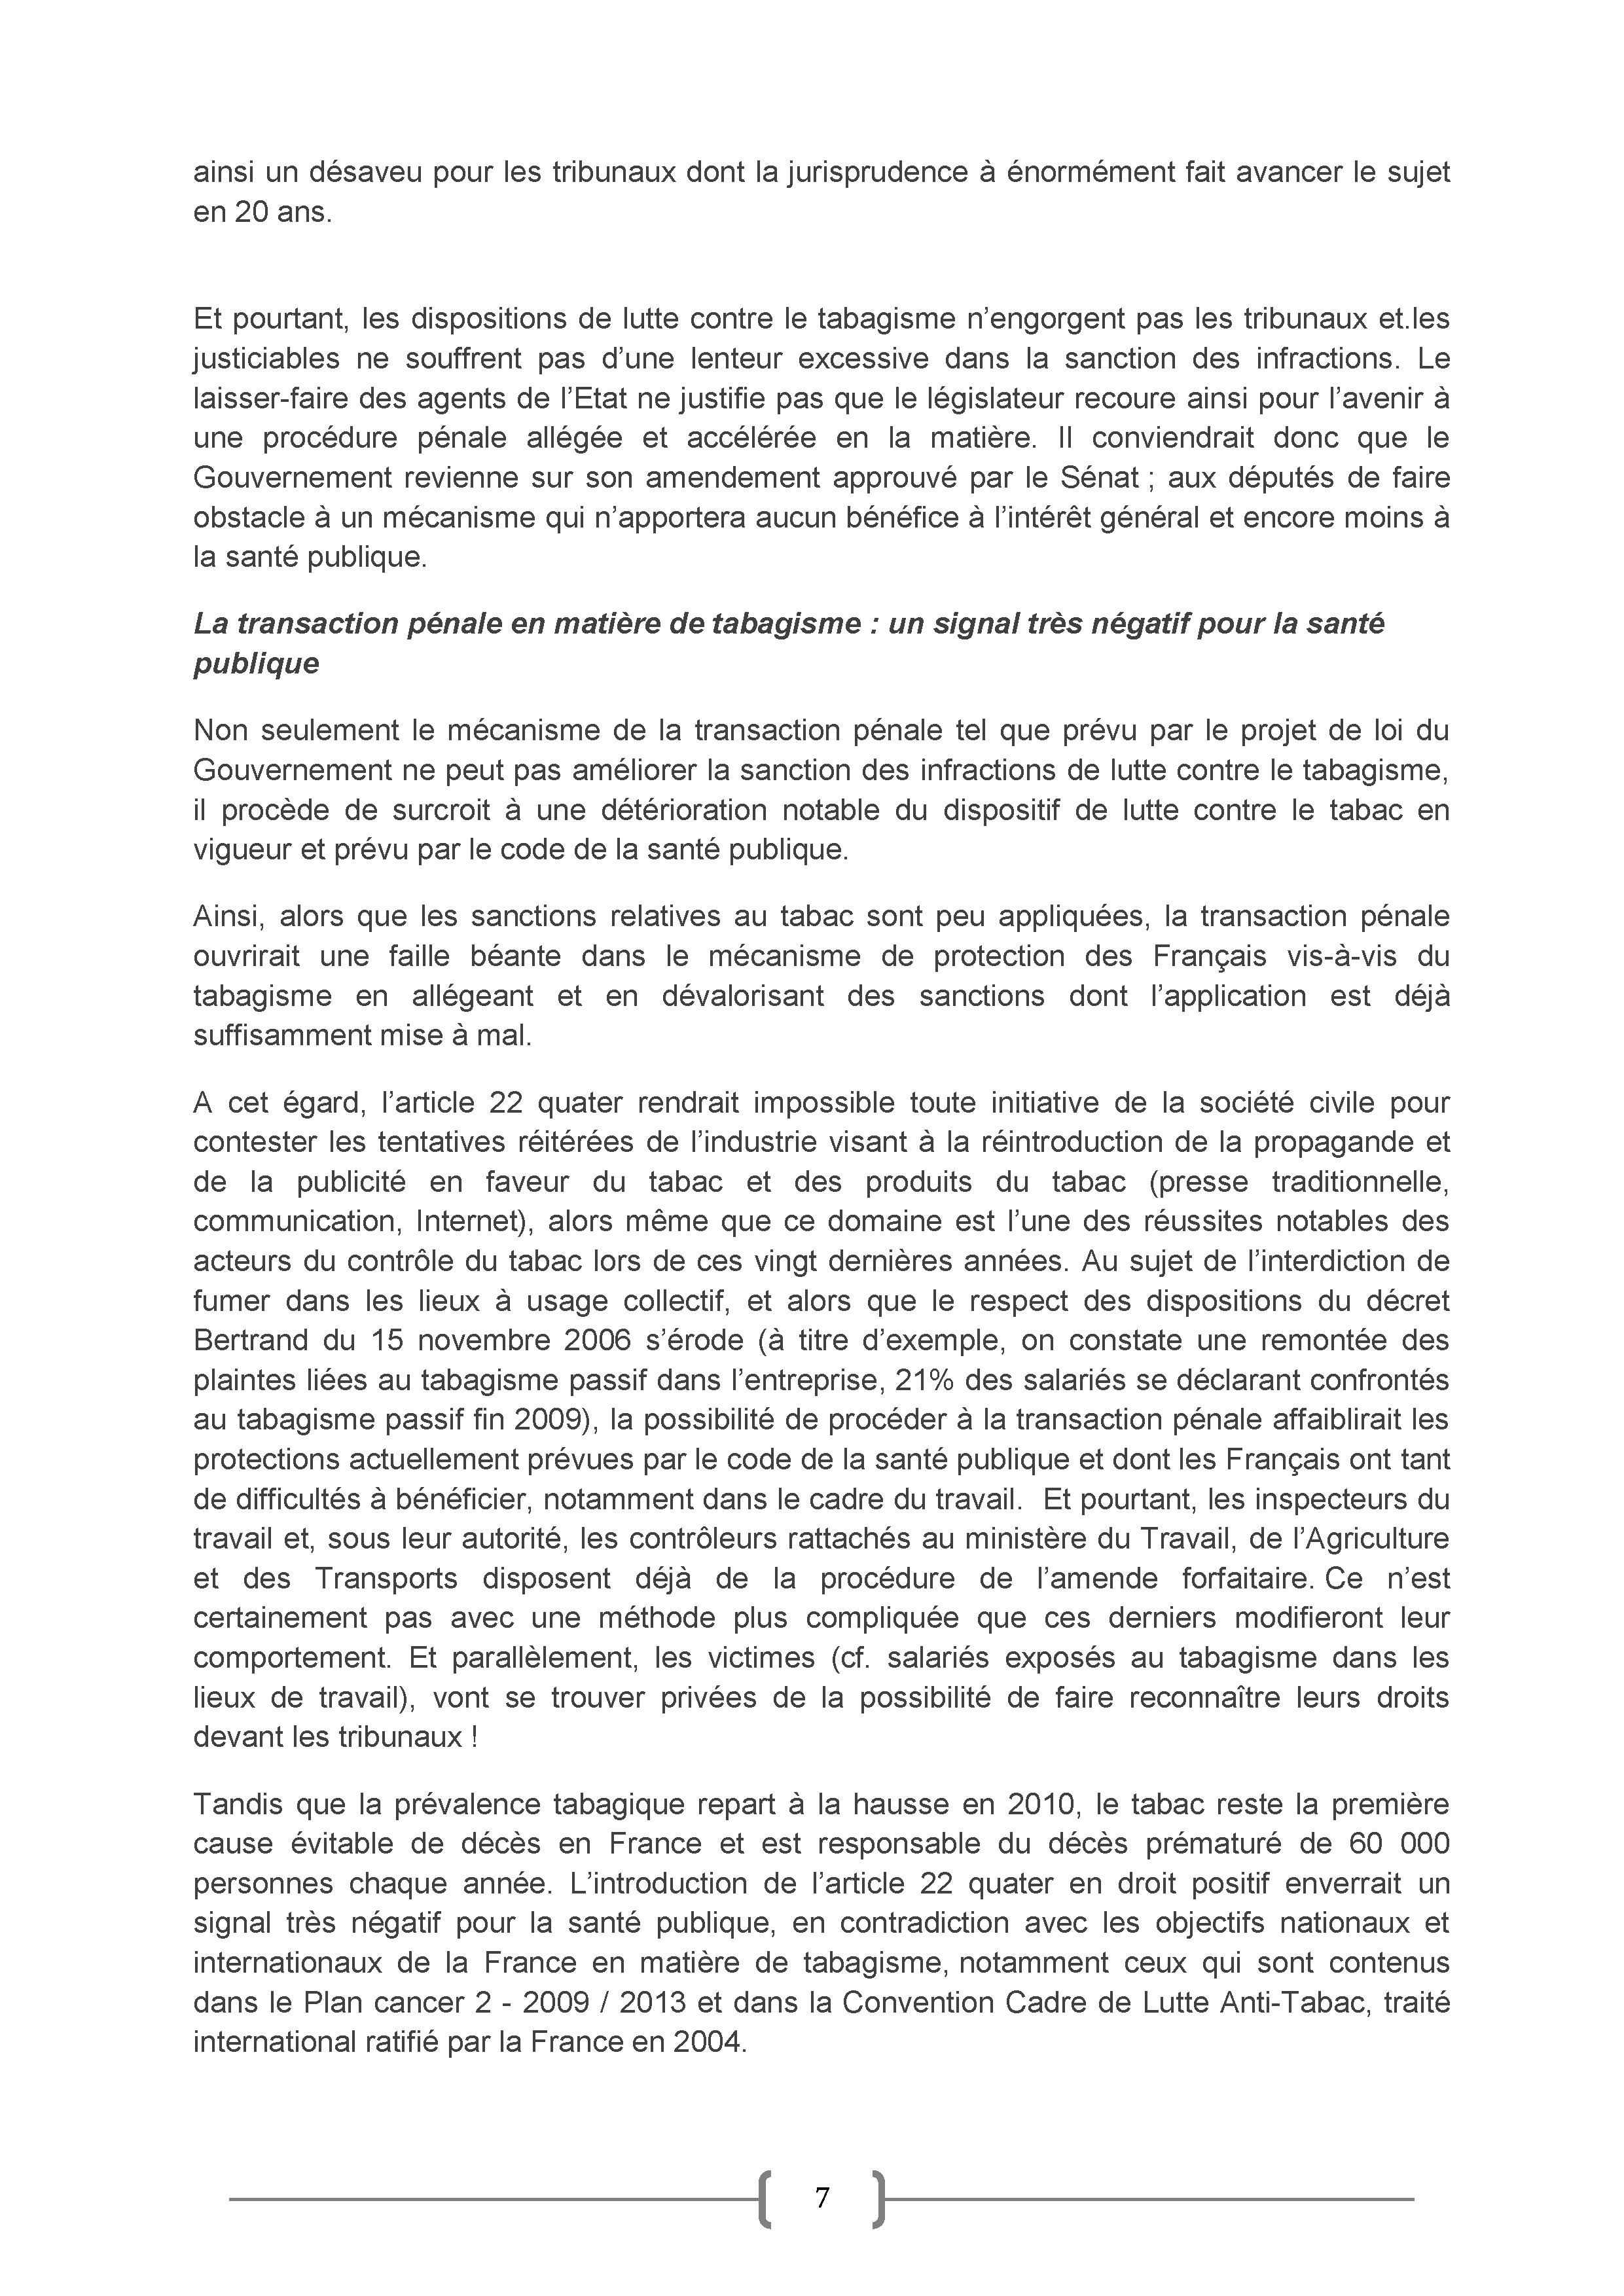 Alliance-DP_projet-loi-article-22-quater_05juil2011_Page_7.jpg